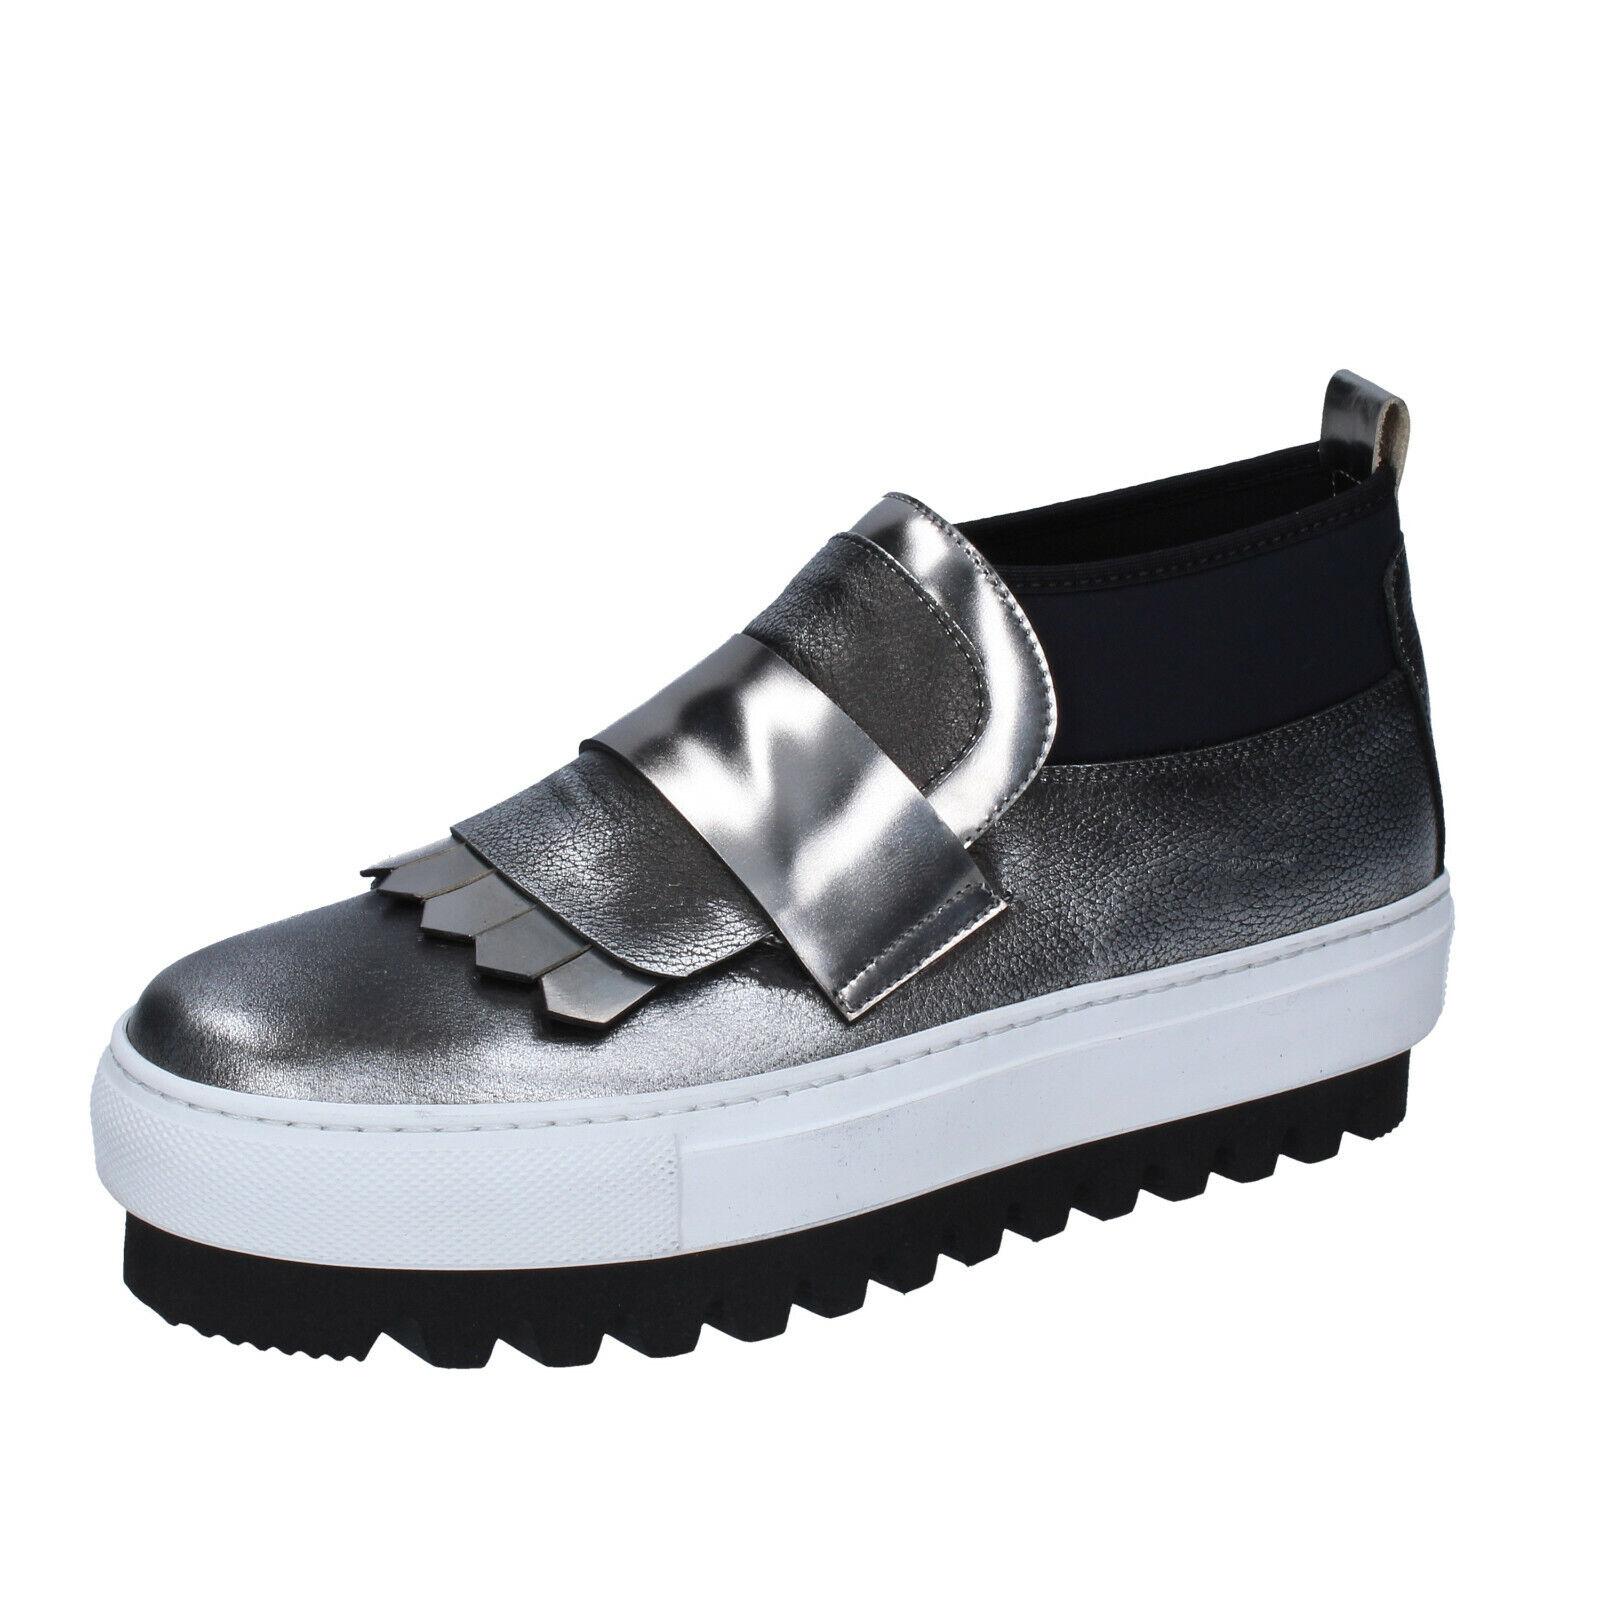 Chaussures femmes Locker 37 UE Slip on argent noir cuir bs966-37